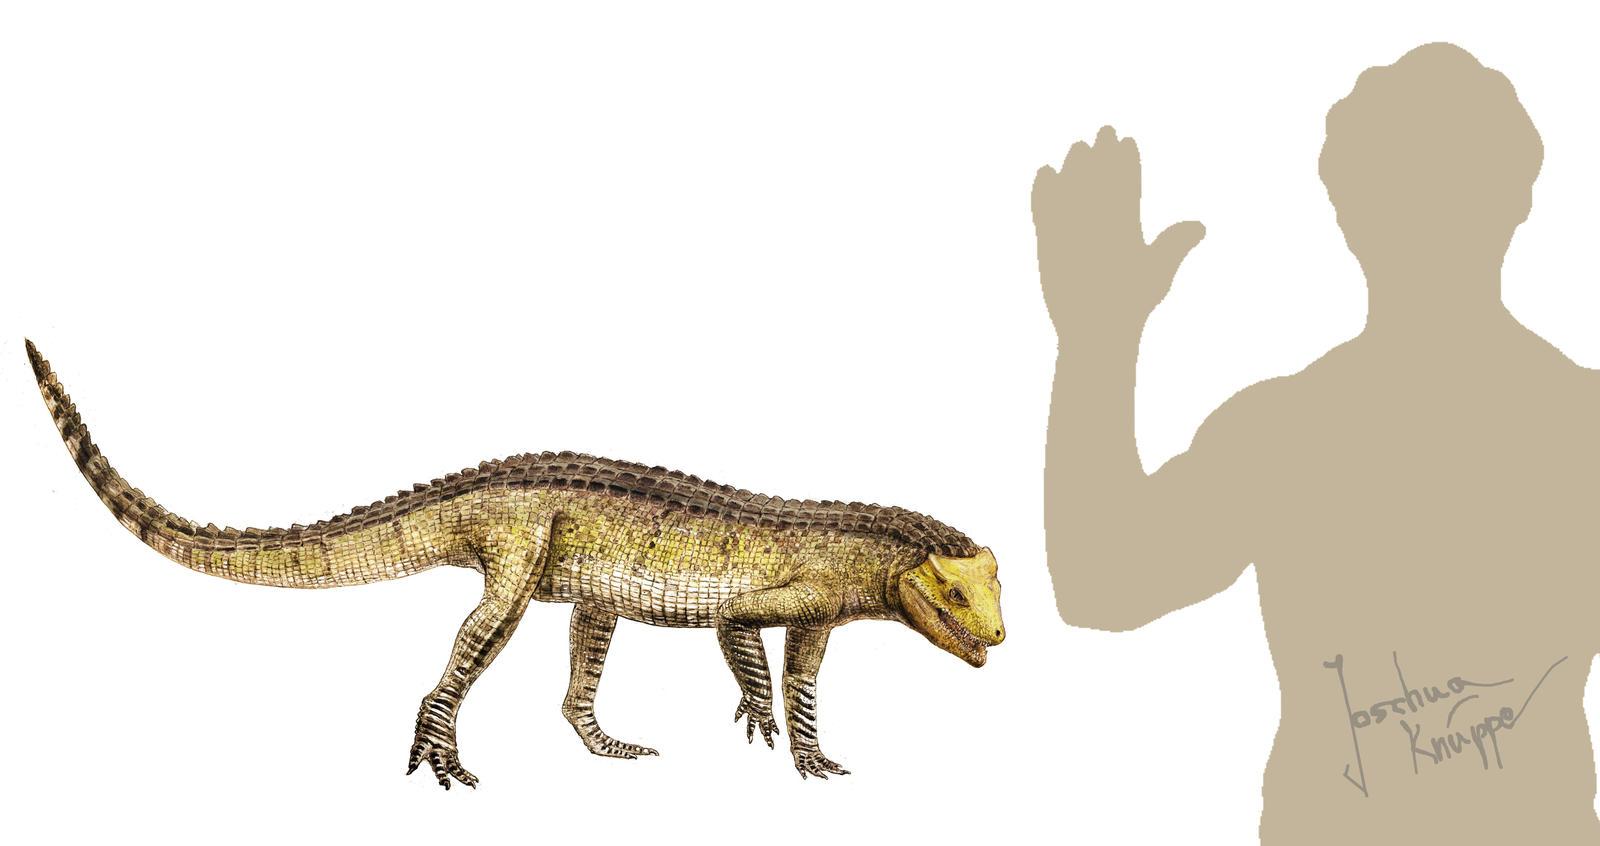 Libycosuchus brevirostris by Hyrotrioskjan